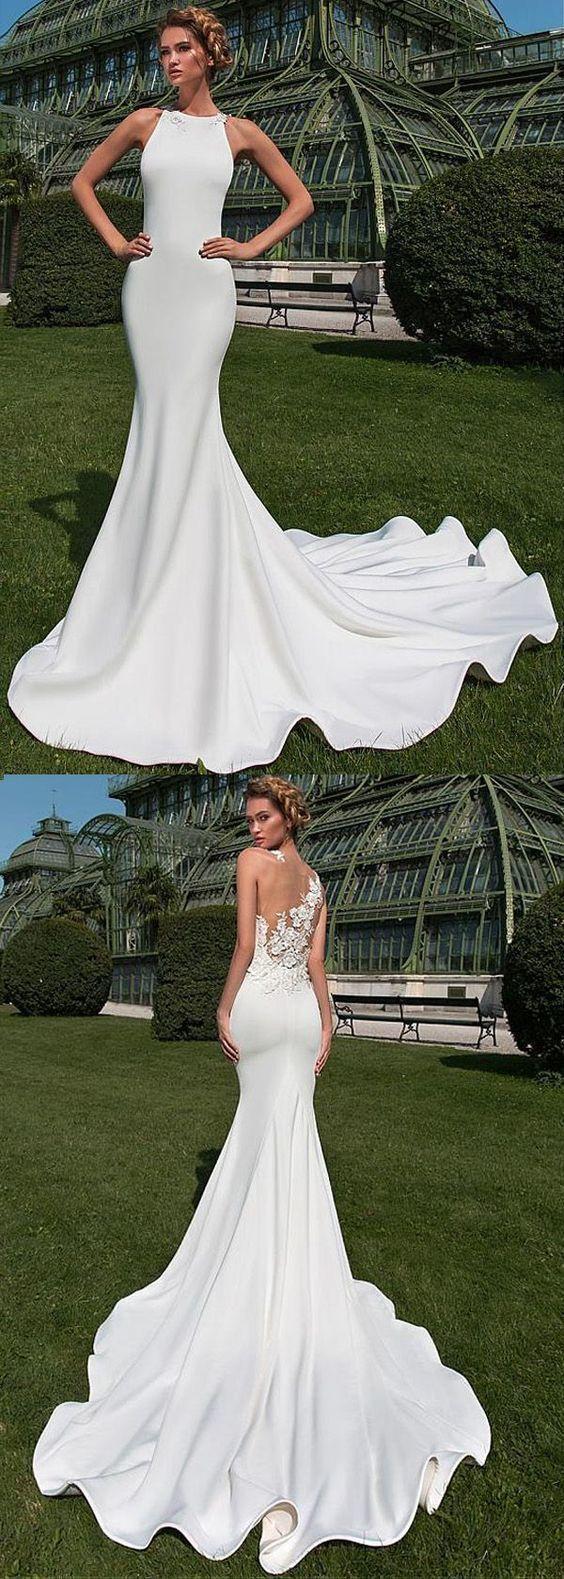 Fabulous Satin Jewel Neckline Mermaid Wedding Dress With Lace Appliques & 3D Flowers & Beadings